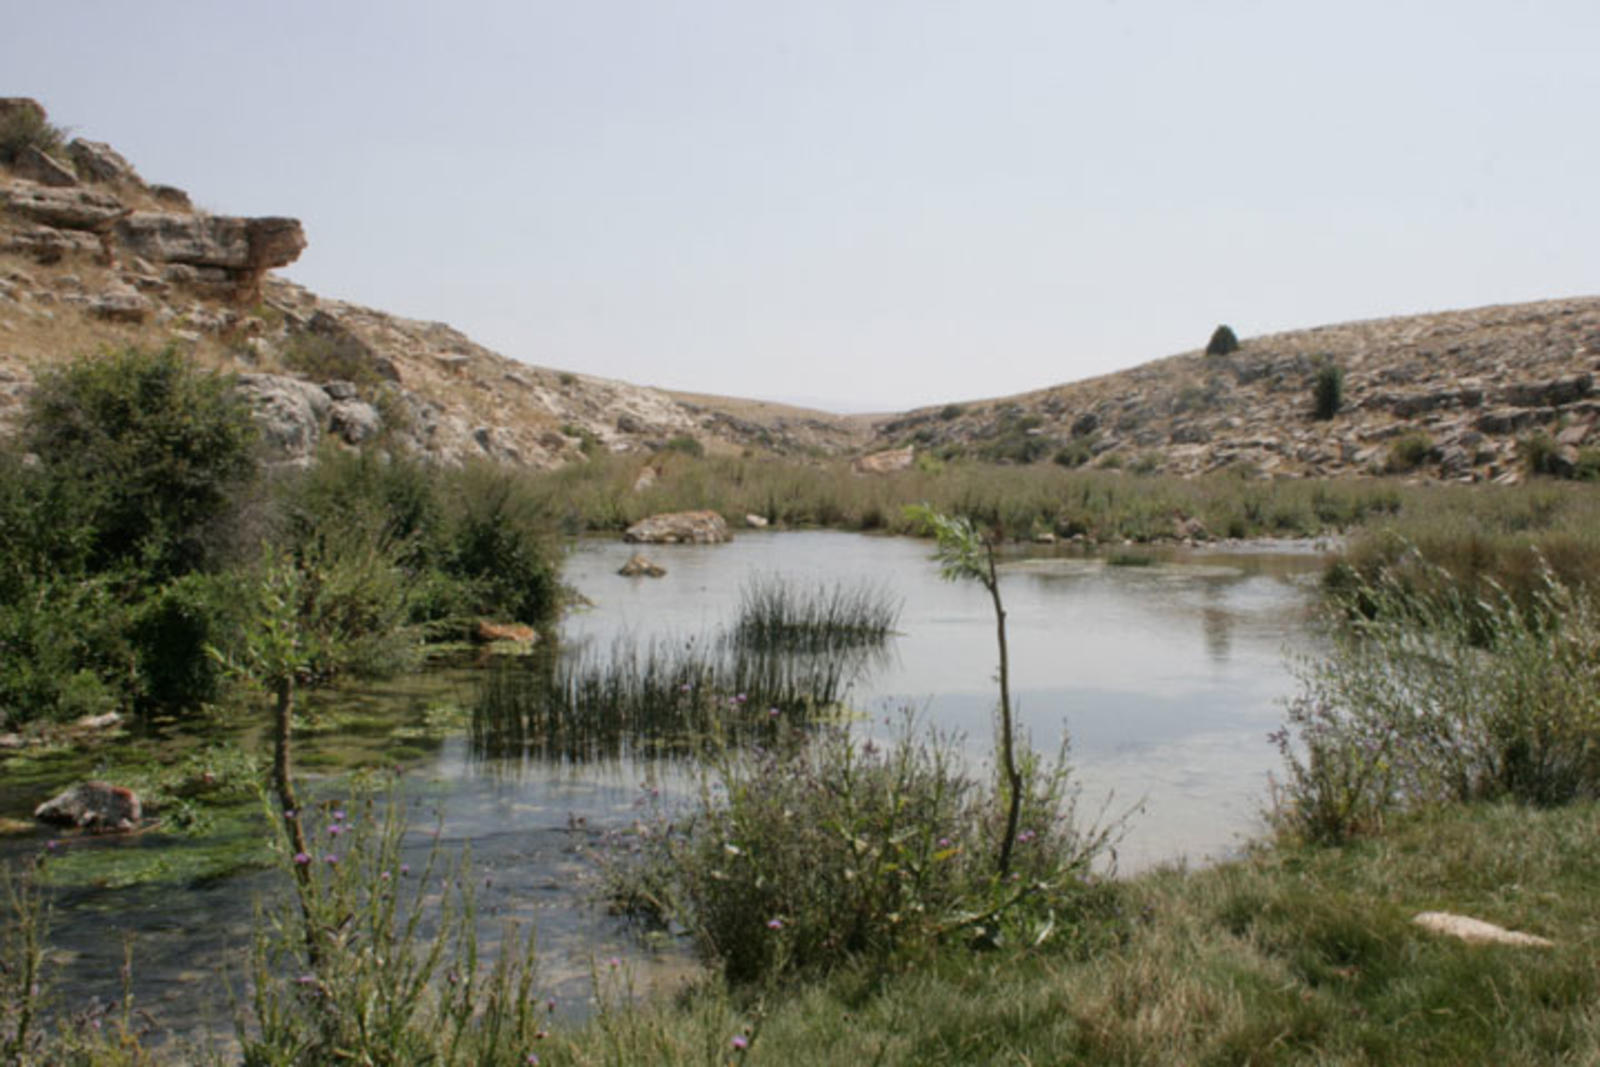 The Seyhan river in Turkey